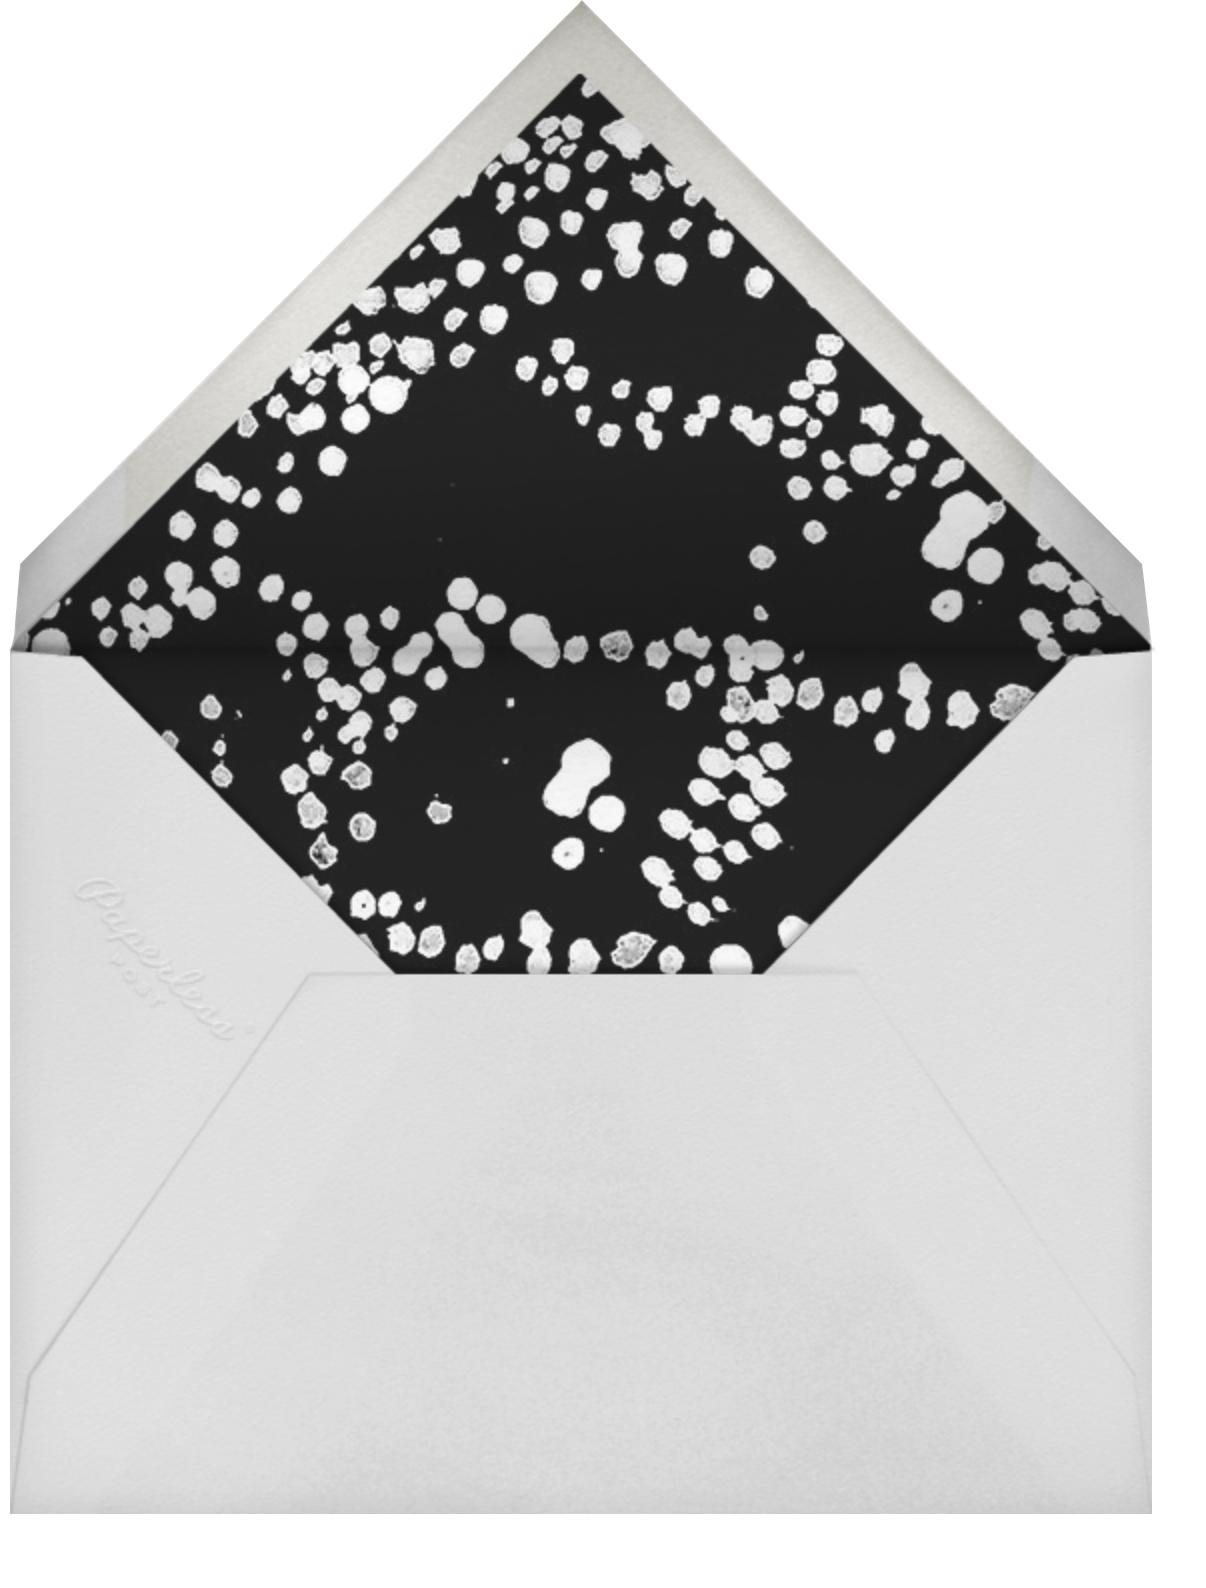 Evoke (Square Photo) - Gold - Kelly Wearstler - Graduation - envelope back